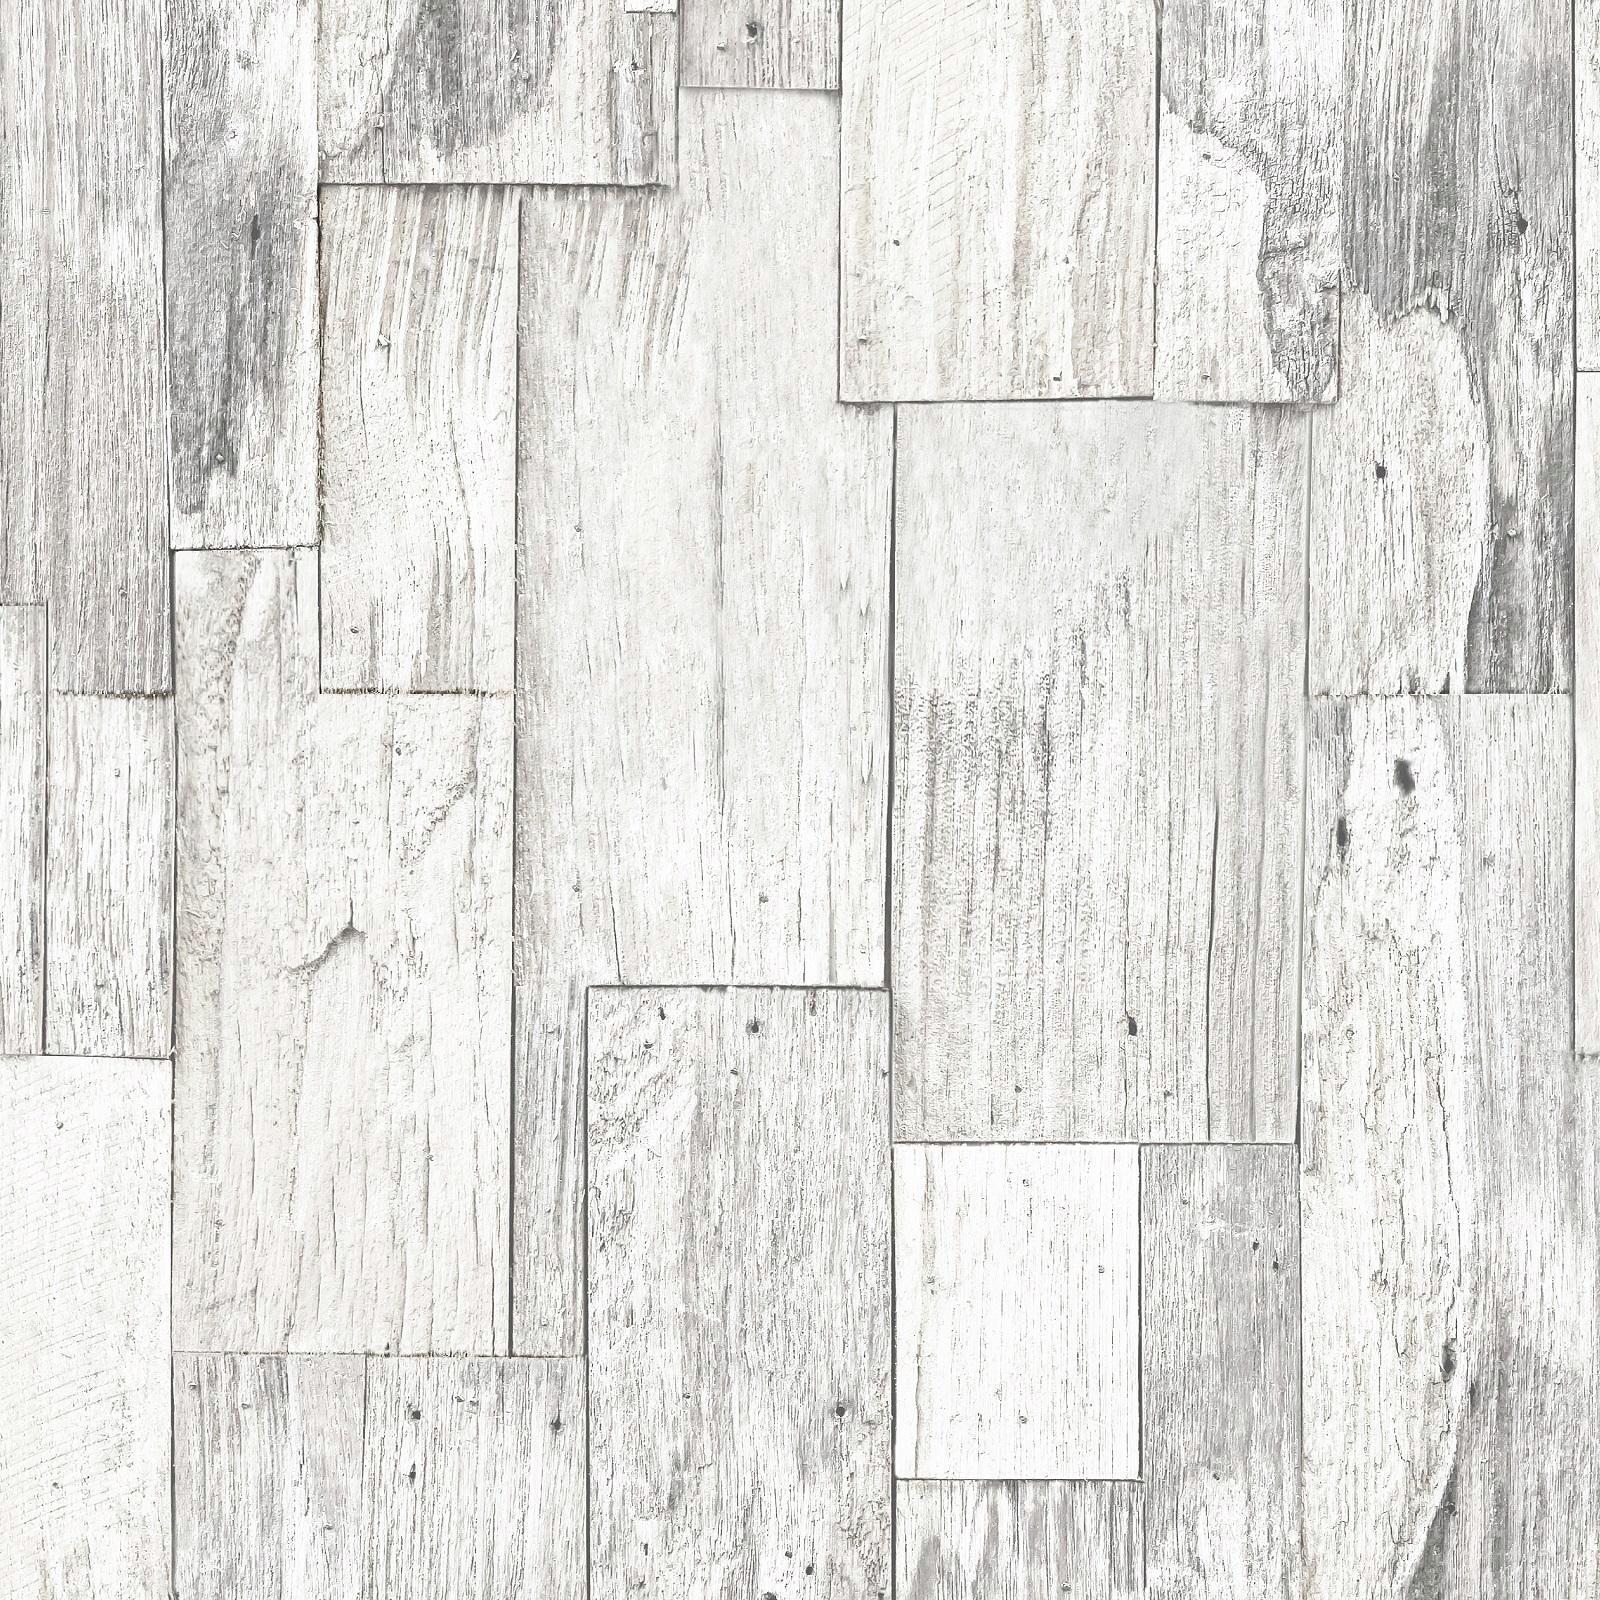 Superfresco Easy 52cm X 10m Shiplap Wood Wallpaper